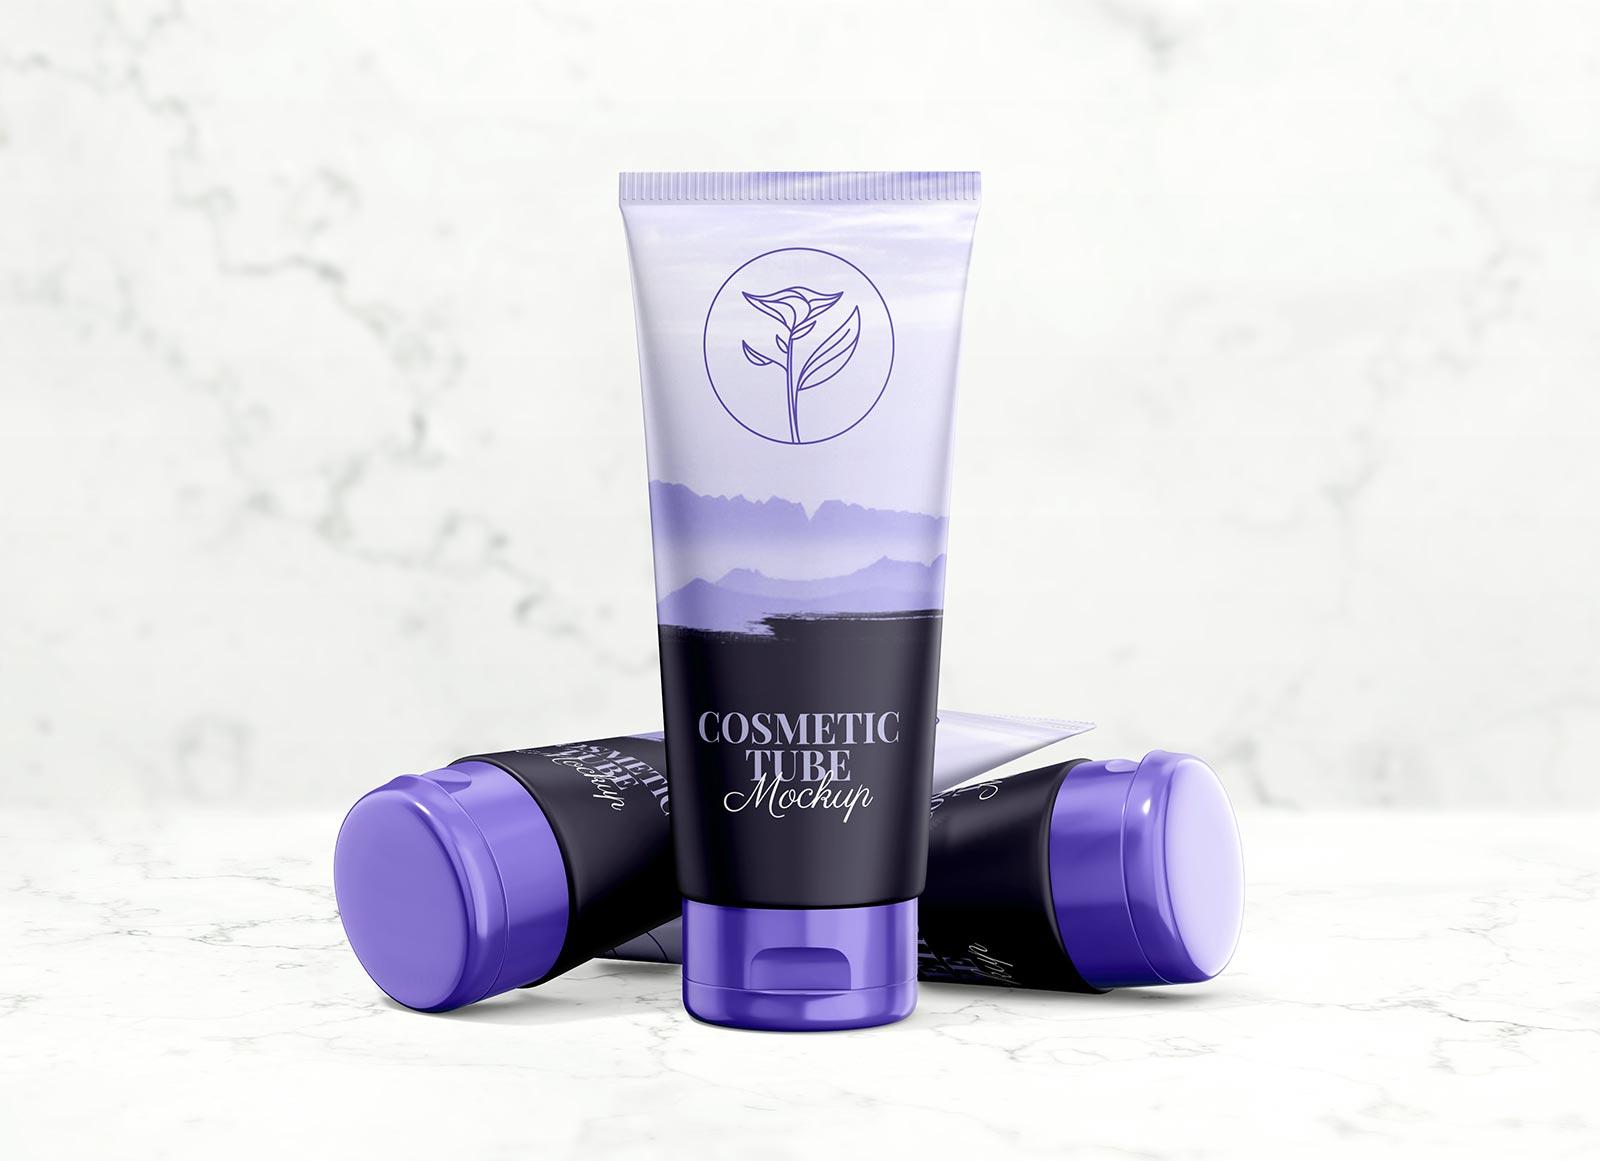 Free-Cosmetic-Cream-Tube-Presentation-Mockup-PSD